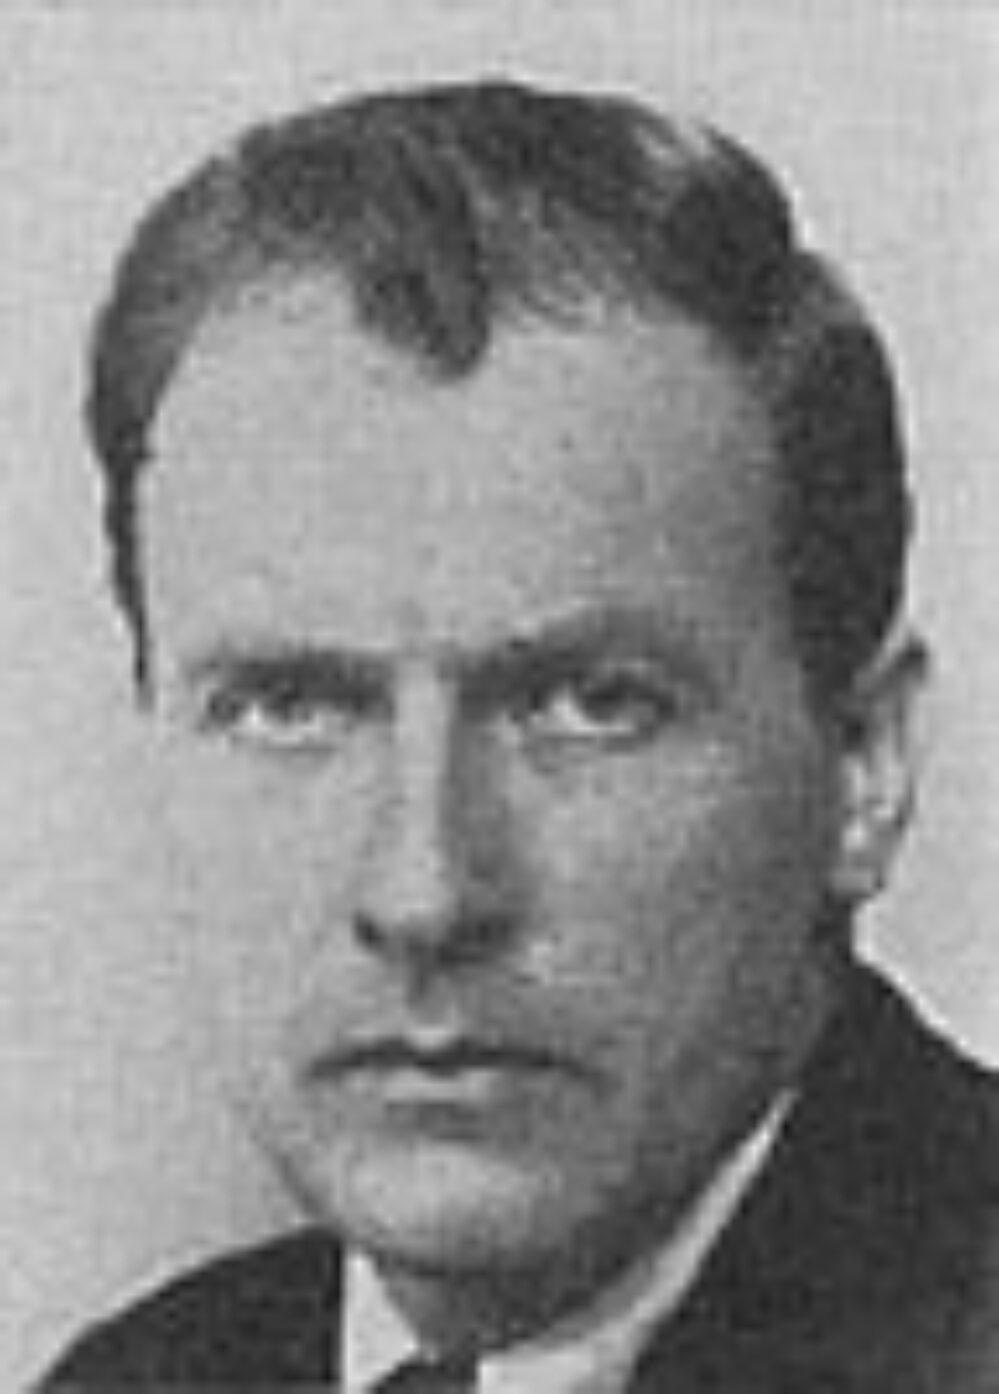 Peder Kristian Bjørshol